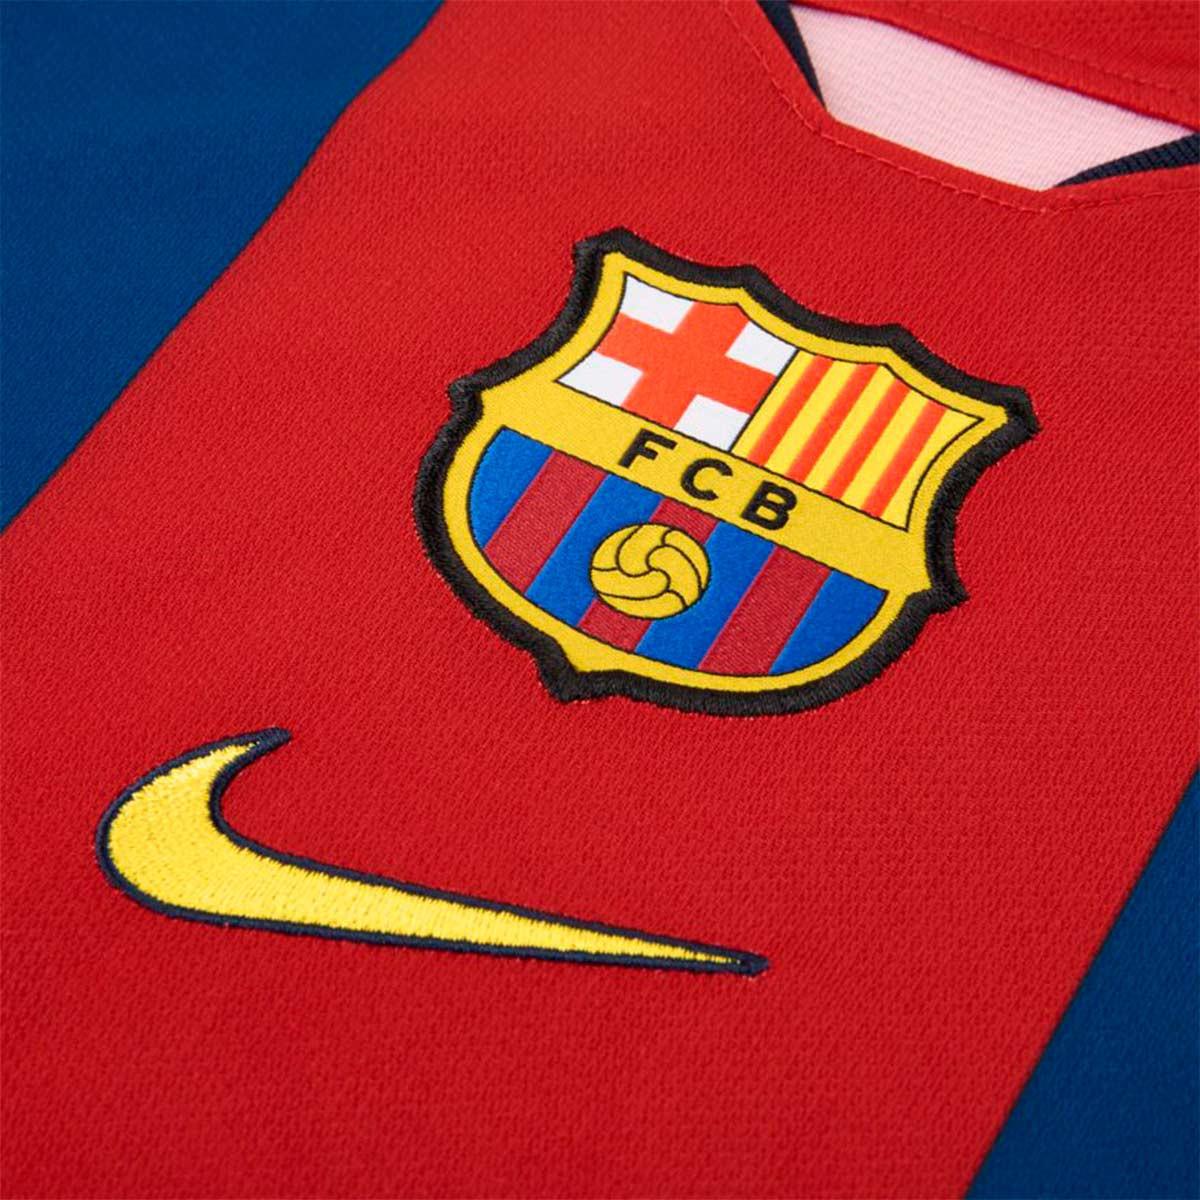 0ed8d308eea Jersey Nike Kids FC Barcelona Breathe Stadium 1998-1999 Collection Gym blue- Canary - Football store Fútbol Emotion